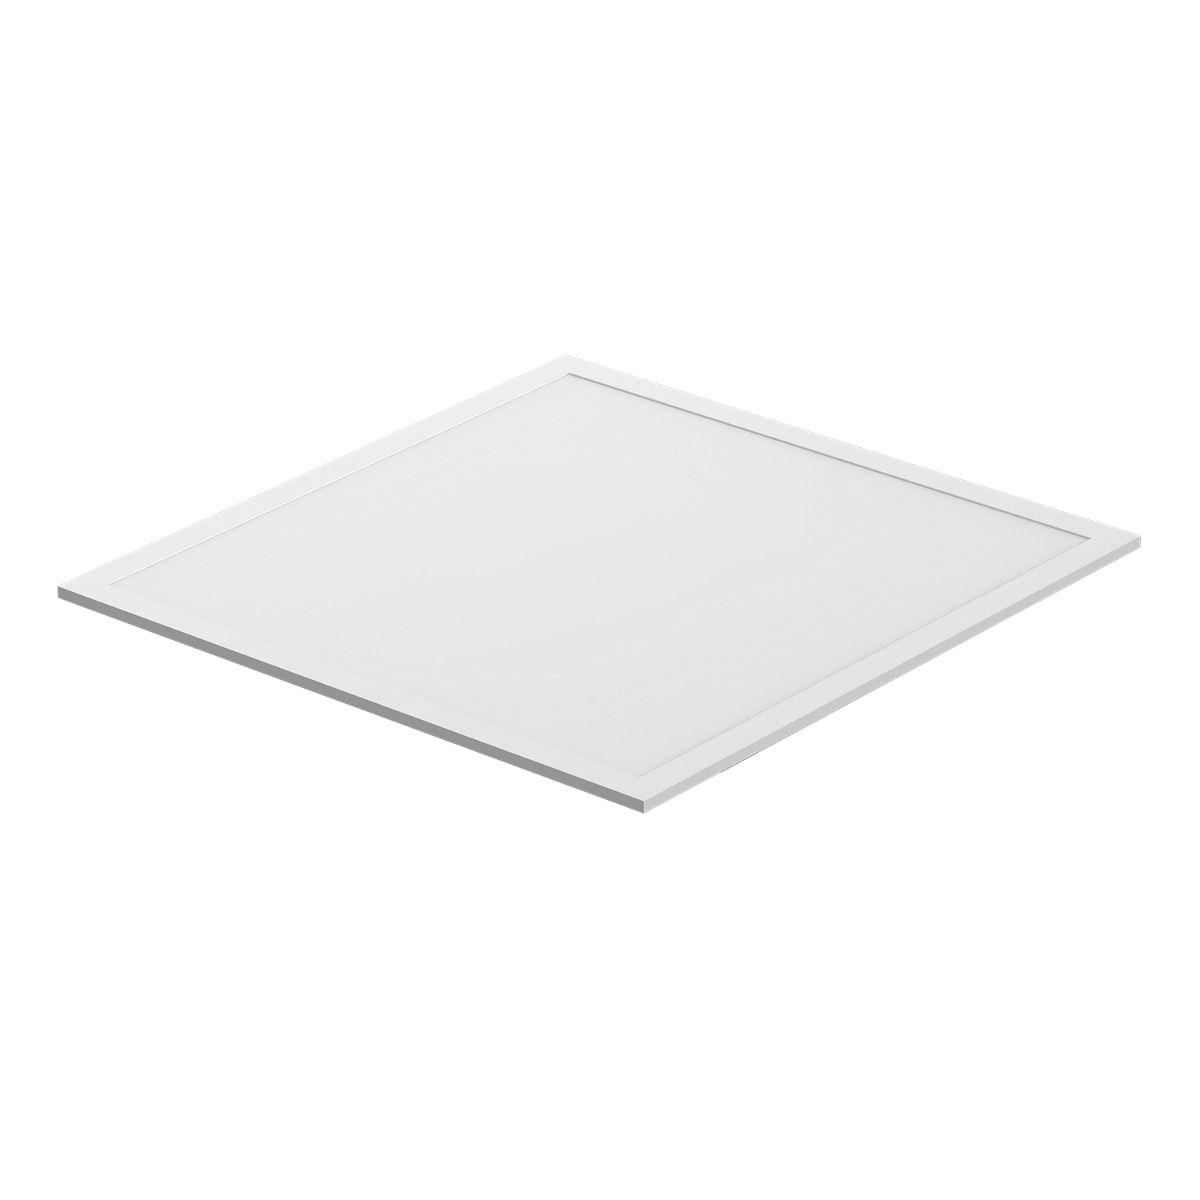 Noxion LED Panel Delta Pro Highlum V2.0 Xitanium DALI 40W 60x60cm 3000K 5280lm UGR